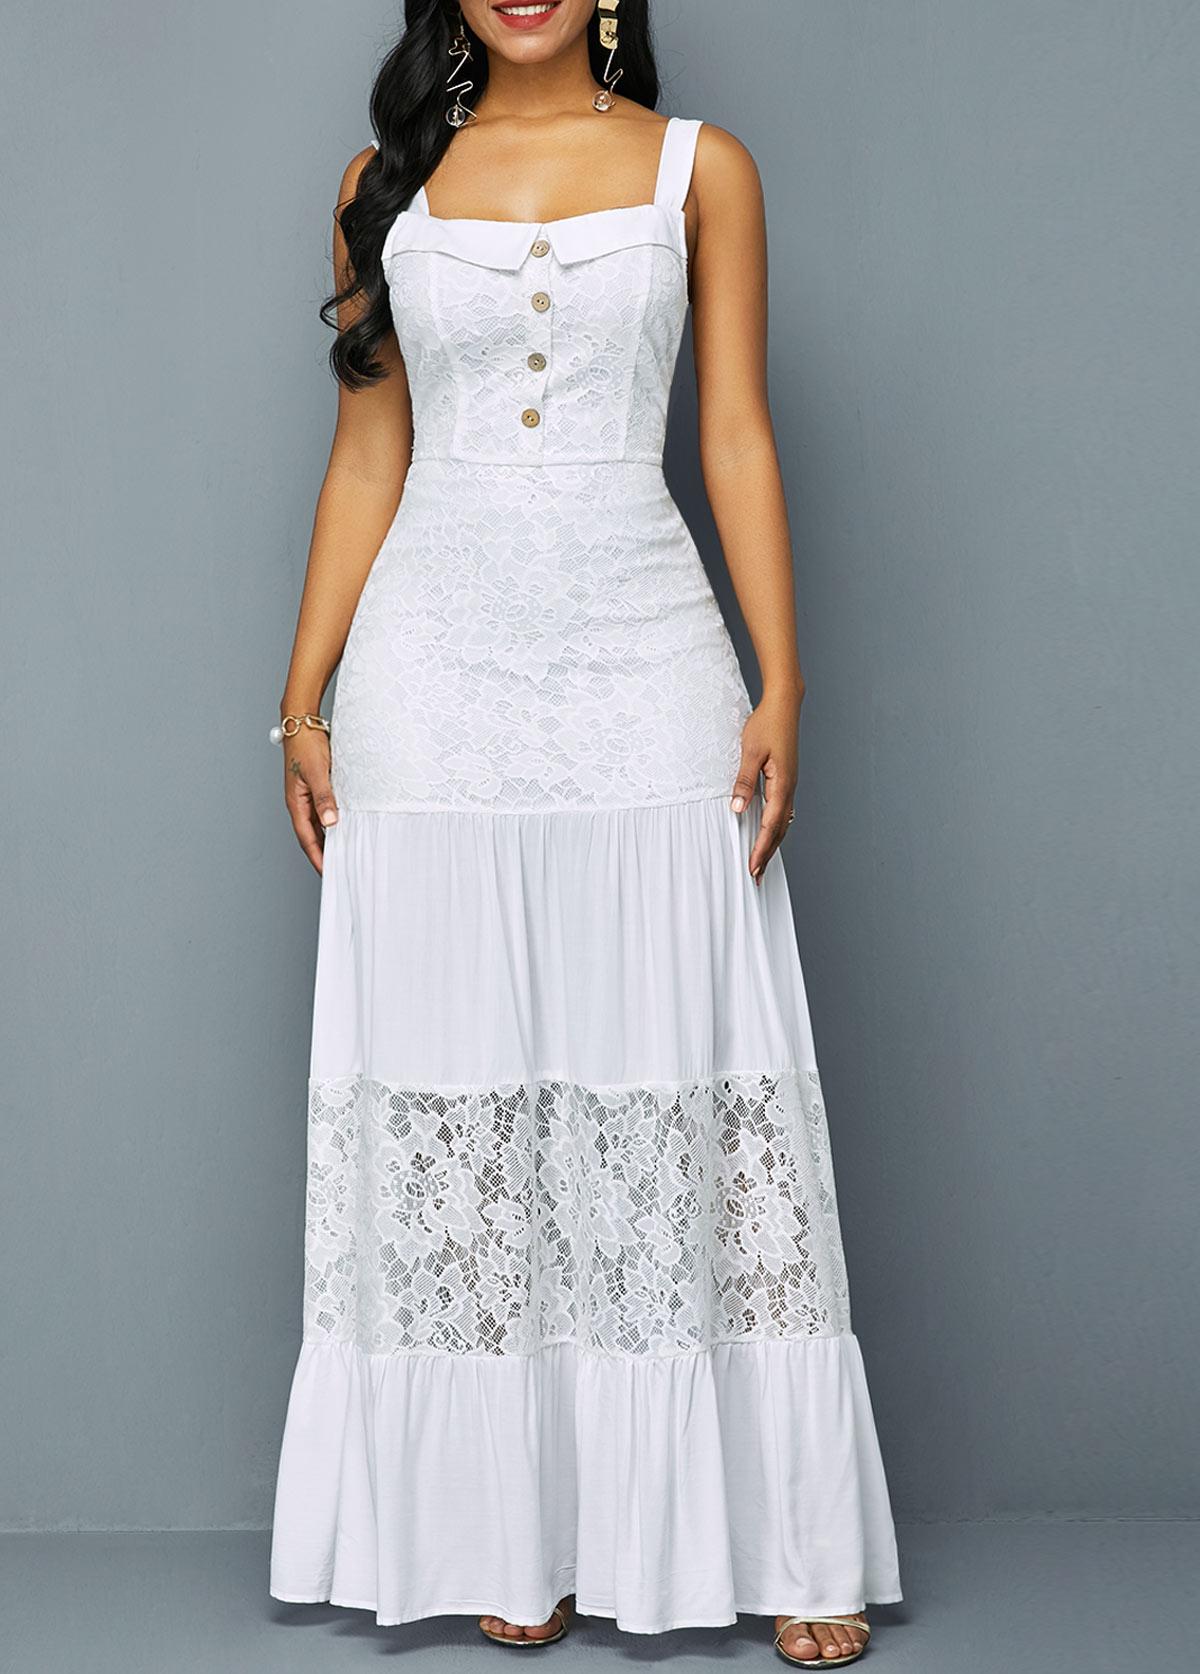 Button Detail Lace Patchwork Ruffle Hem Dress